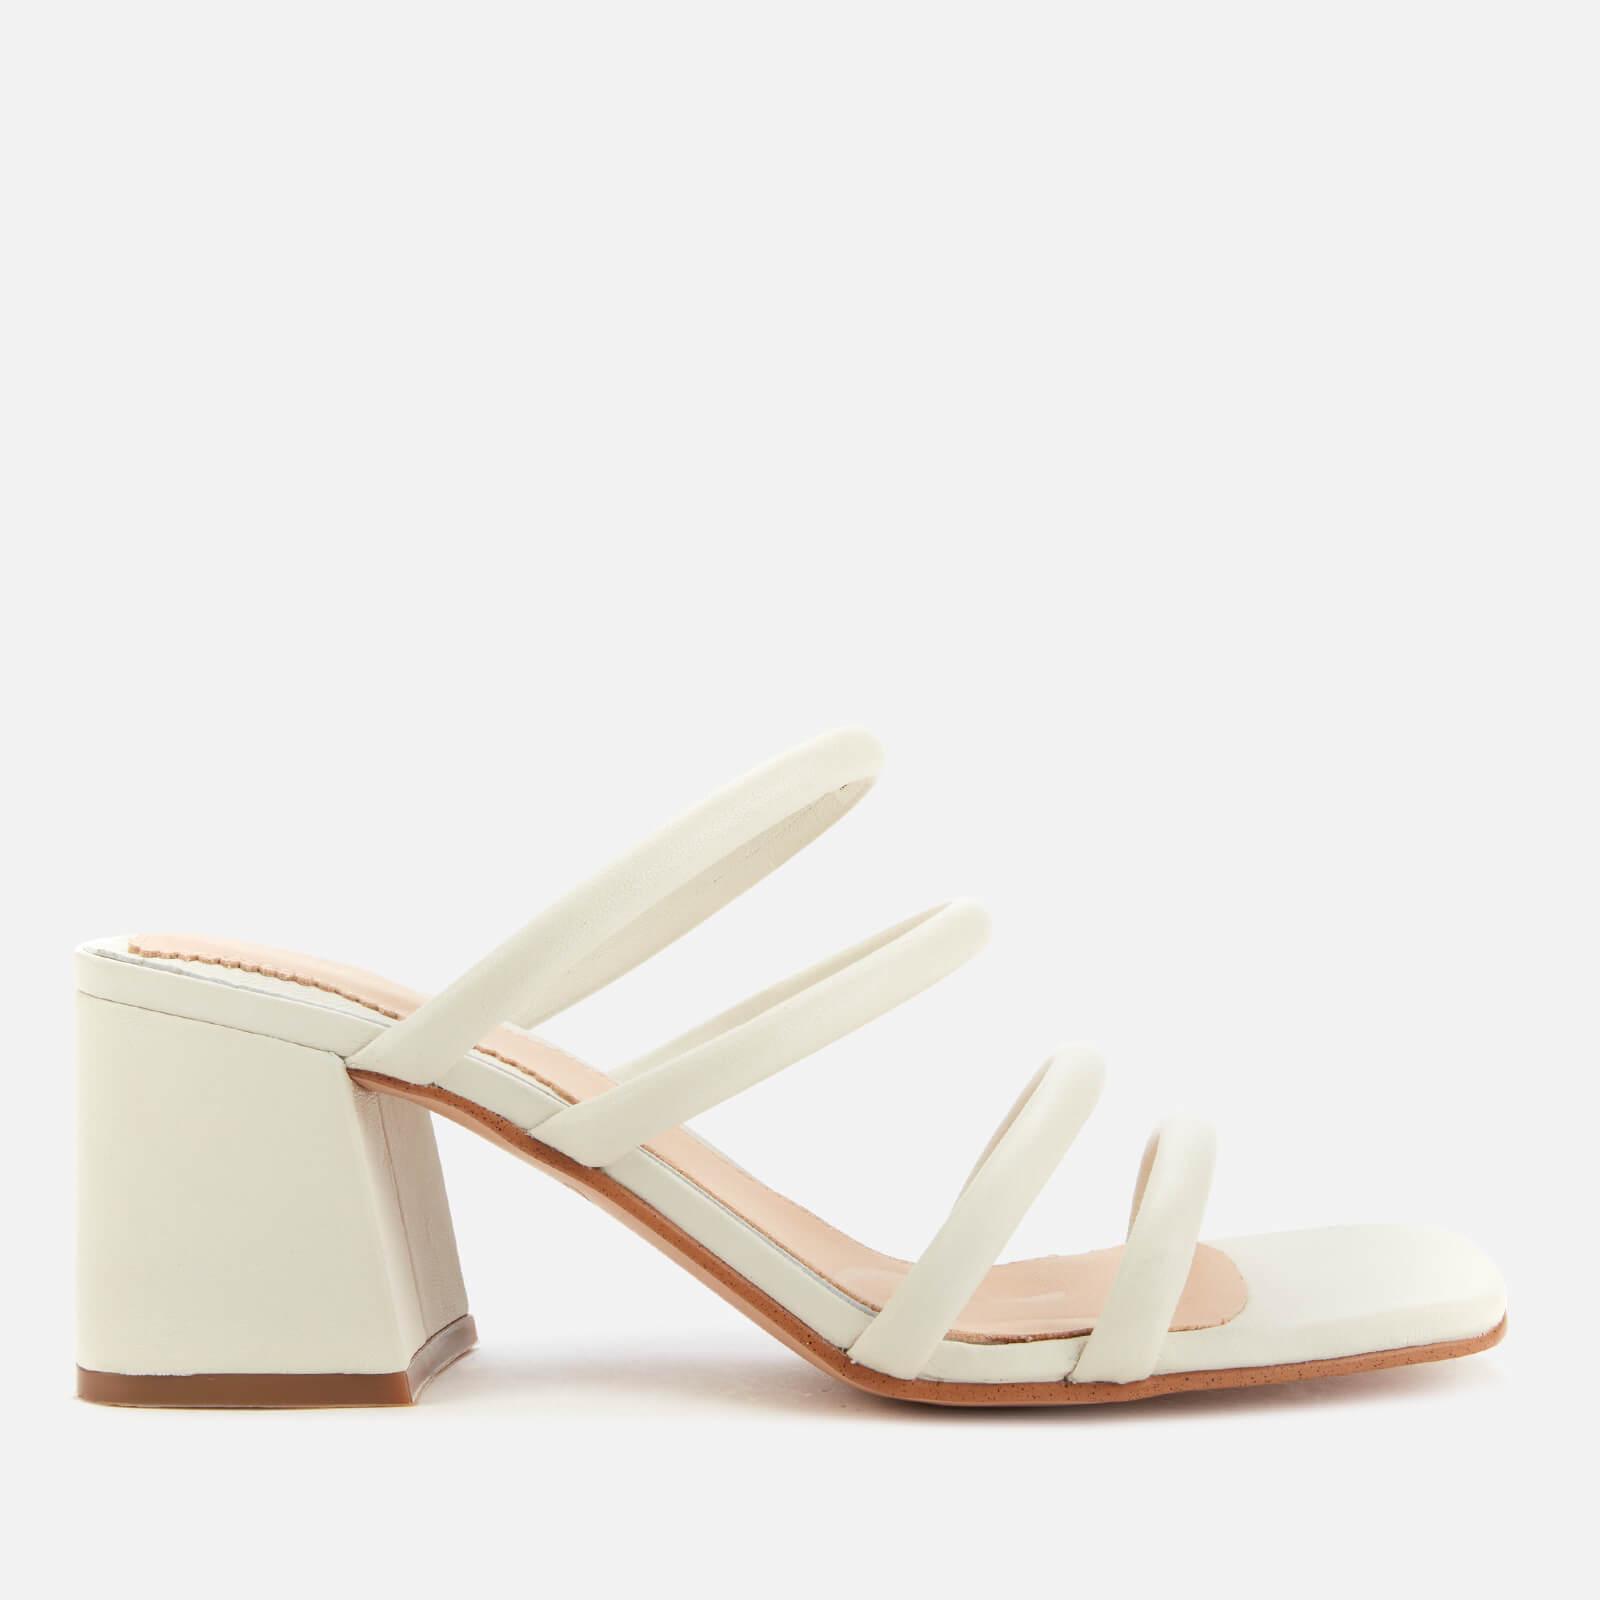 Clarks Women's Sheer65 Leather Heeled Mules - White - Uk 3